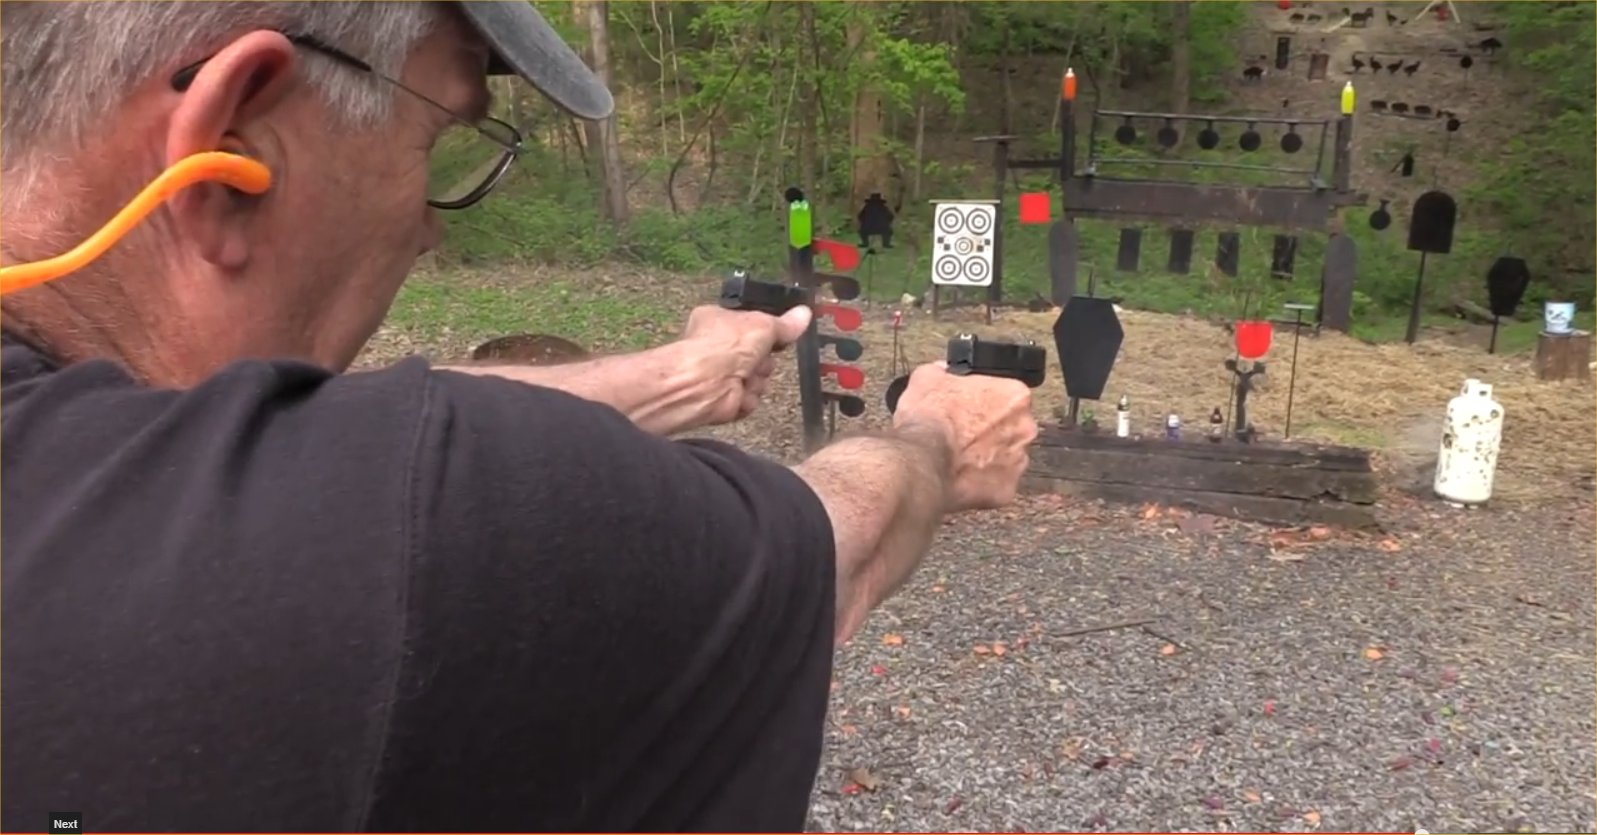 Single Stack 9mm Subcompact Pistols Glock 43 Single-stack 9mm